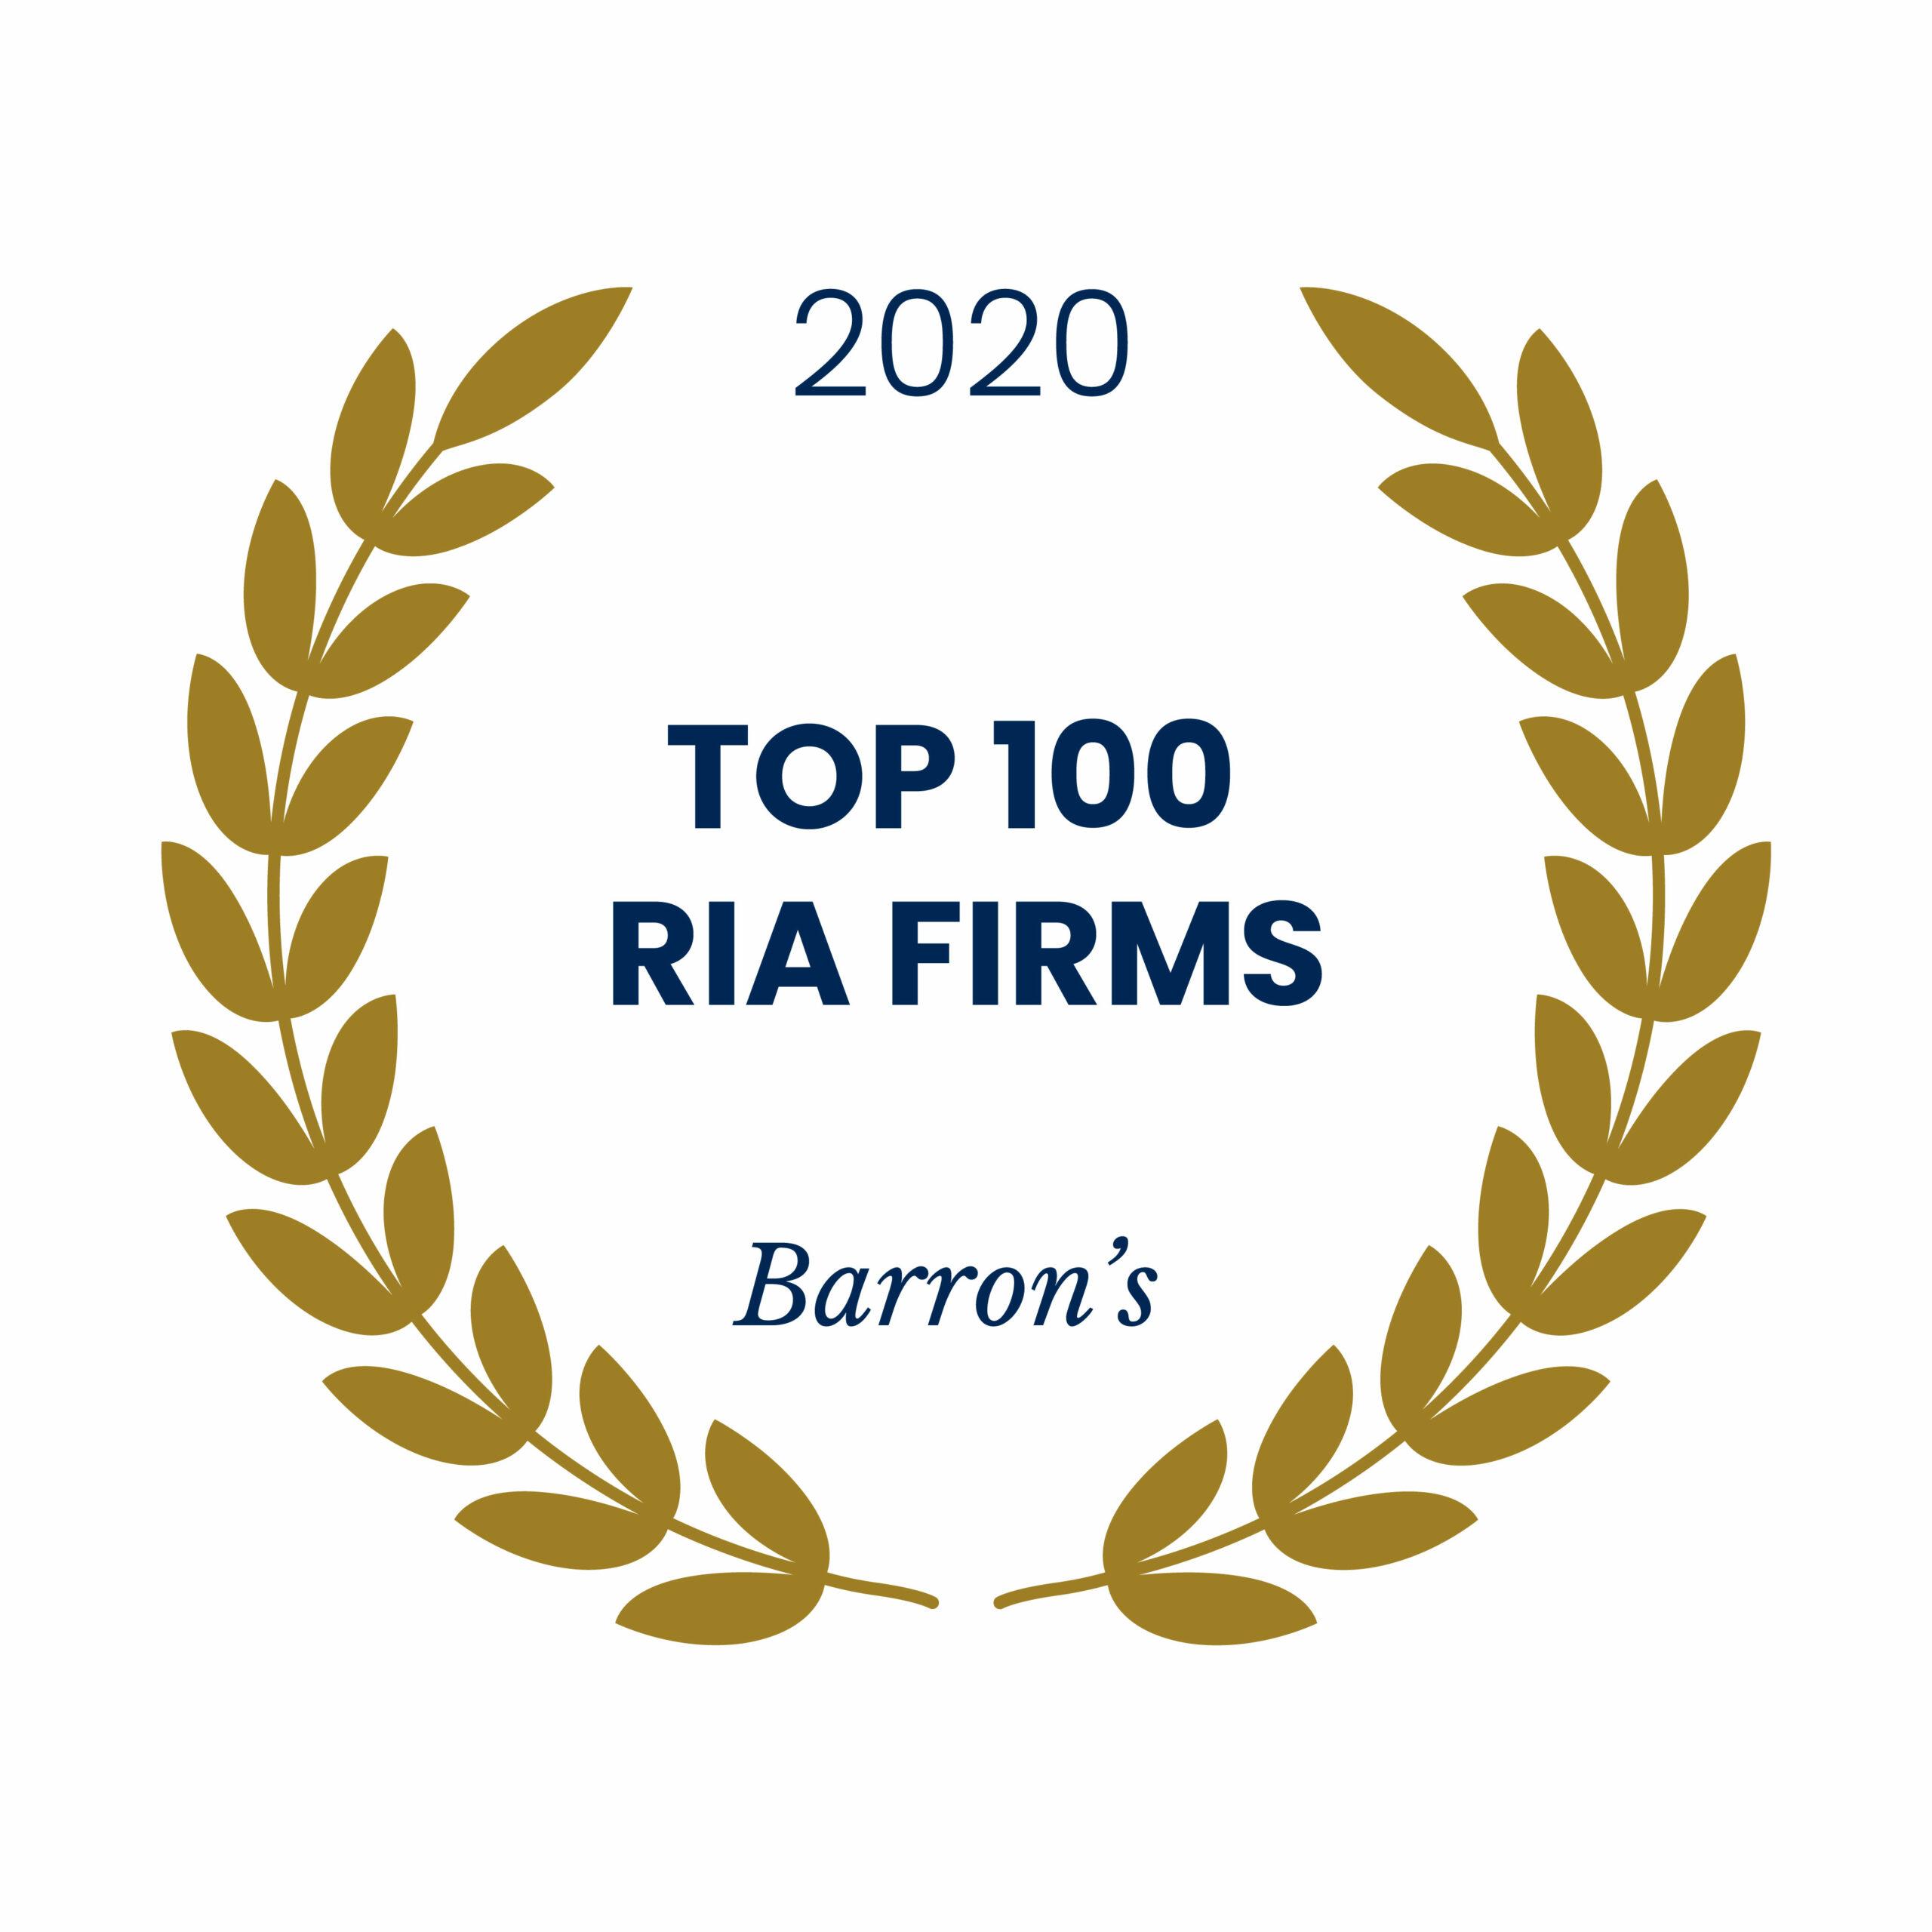 Award emblem for Barron's Top 100 RIA Firms